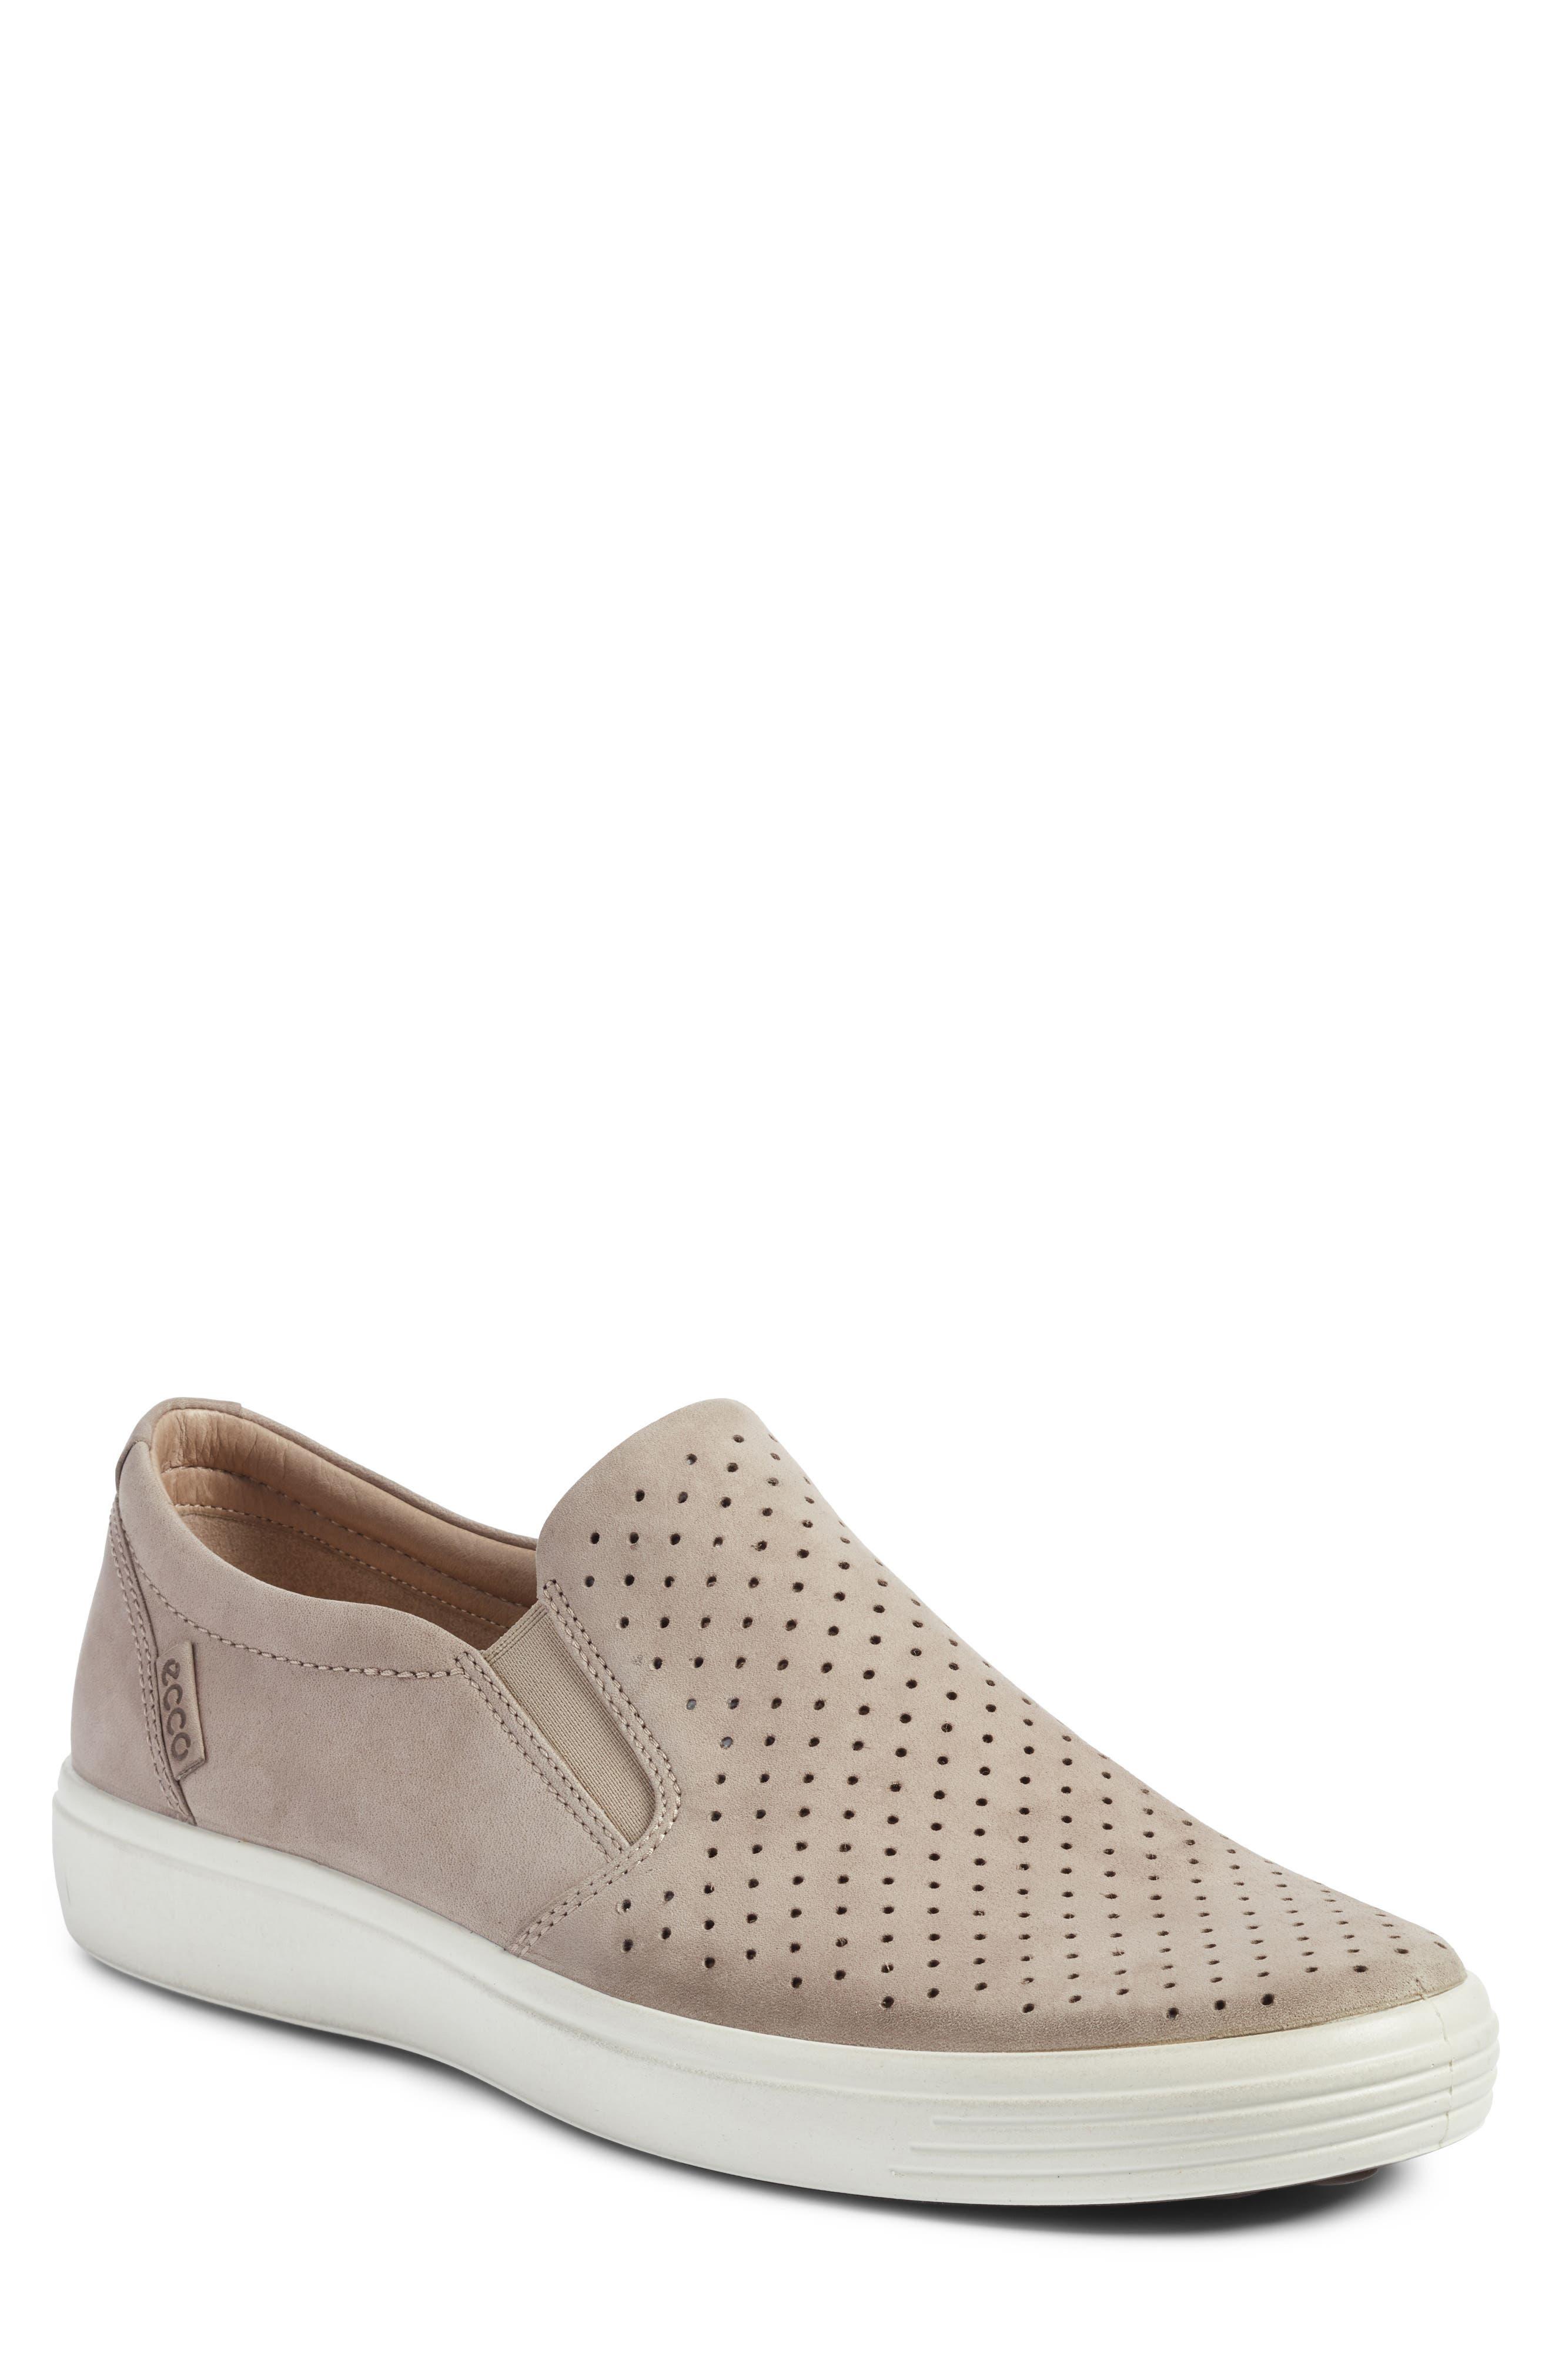 Soft 7 Retro Slip-On Sneaker,                             Main thumbnail 1, color,                             Moonrock Leather